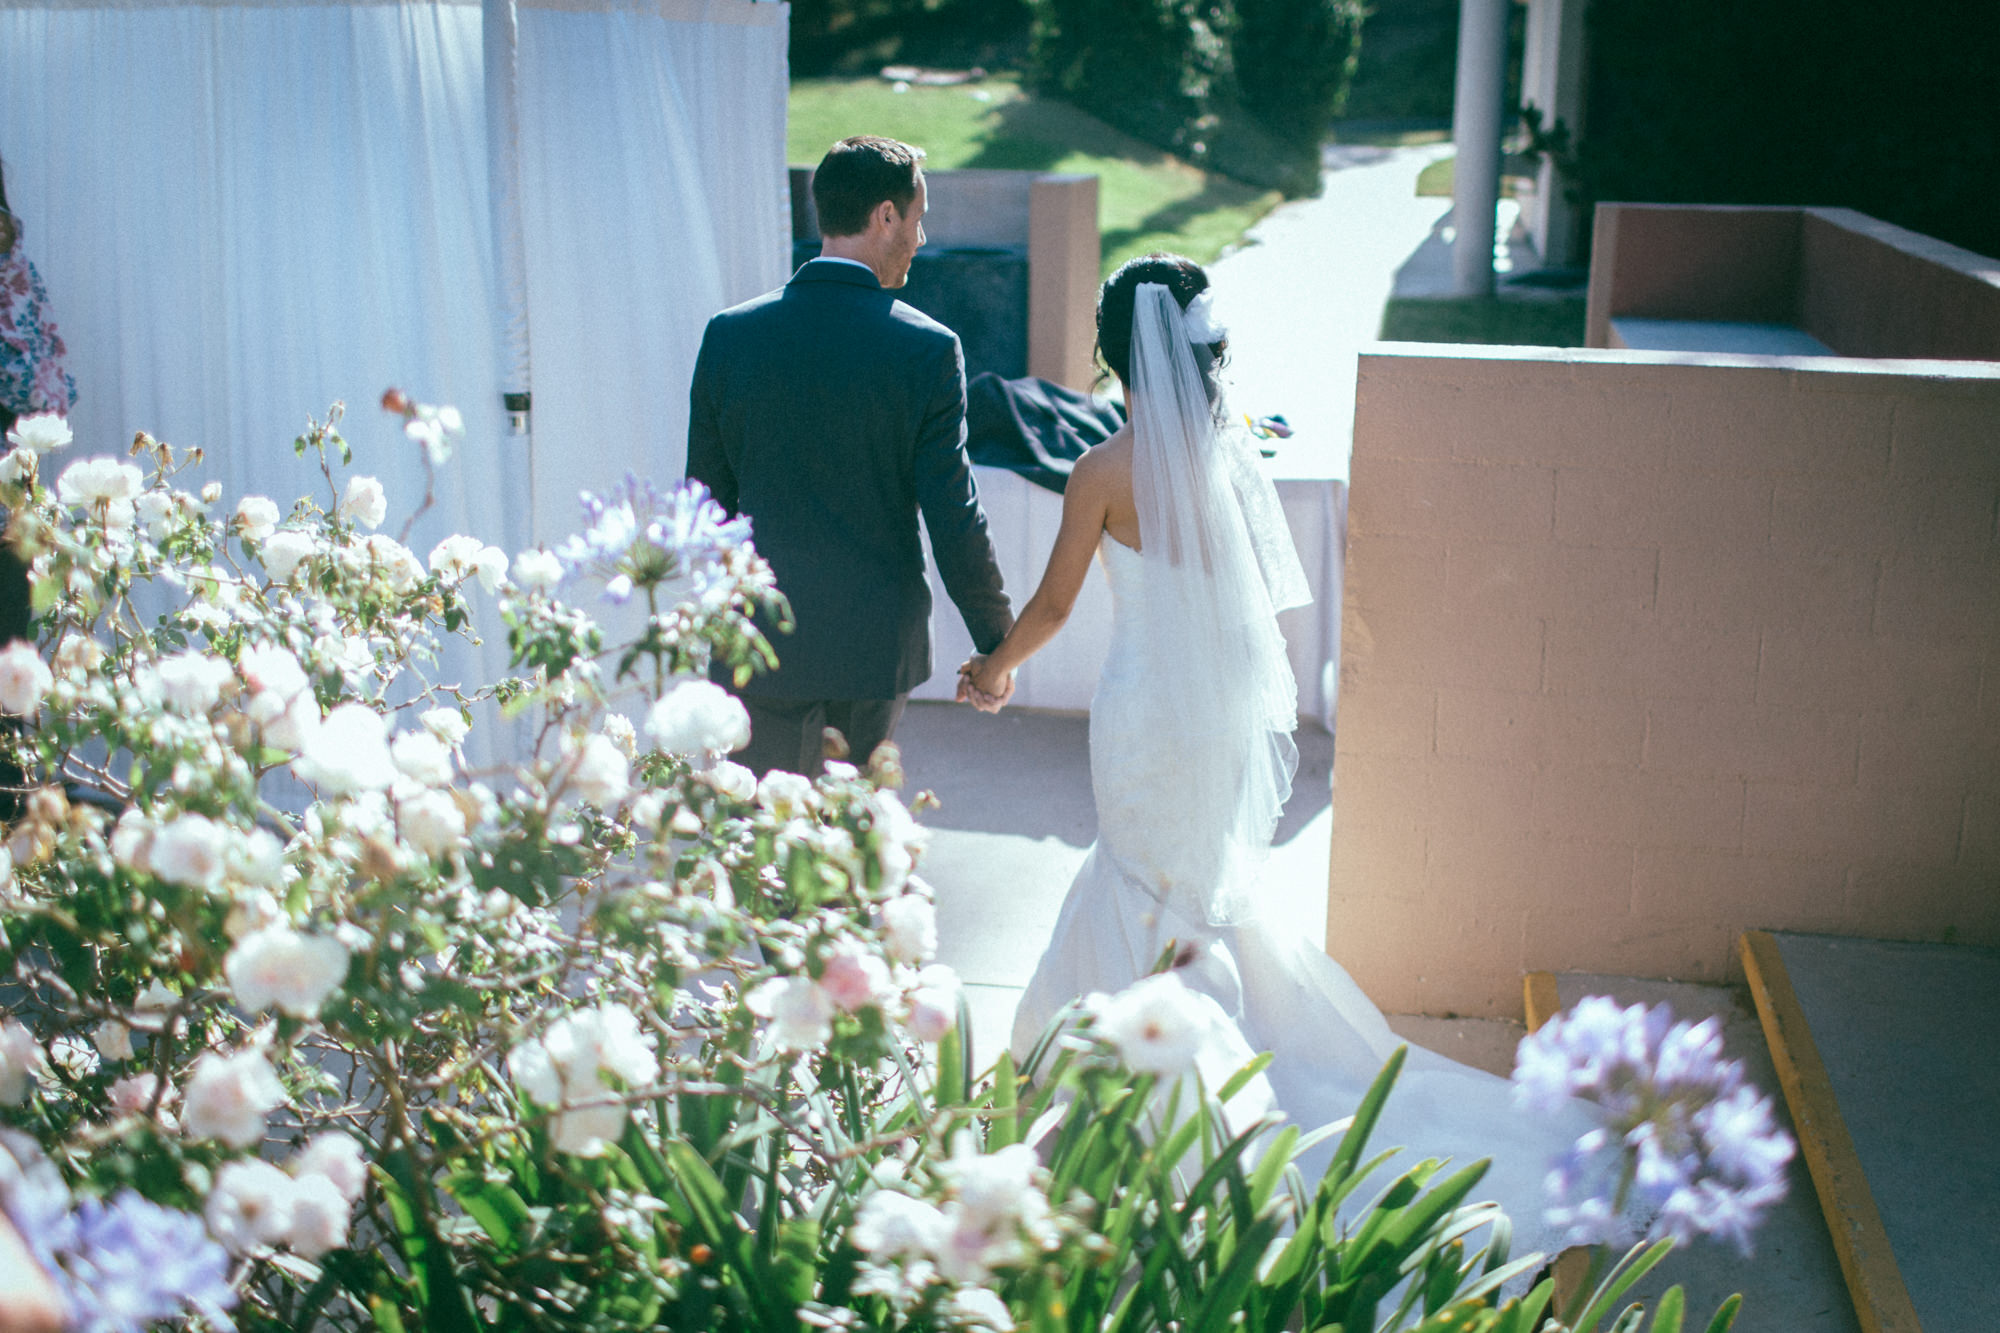 Alice_&_Aaron_Wedding_by_The_Light_&_Glass_Photography-092.jpg